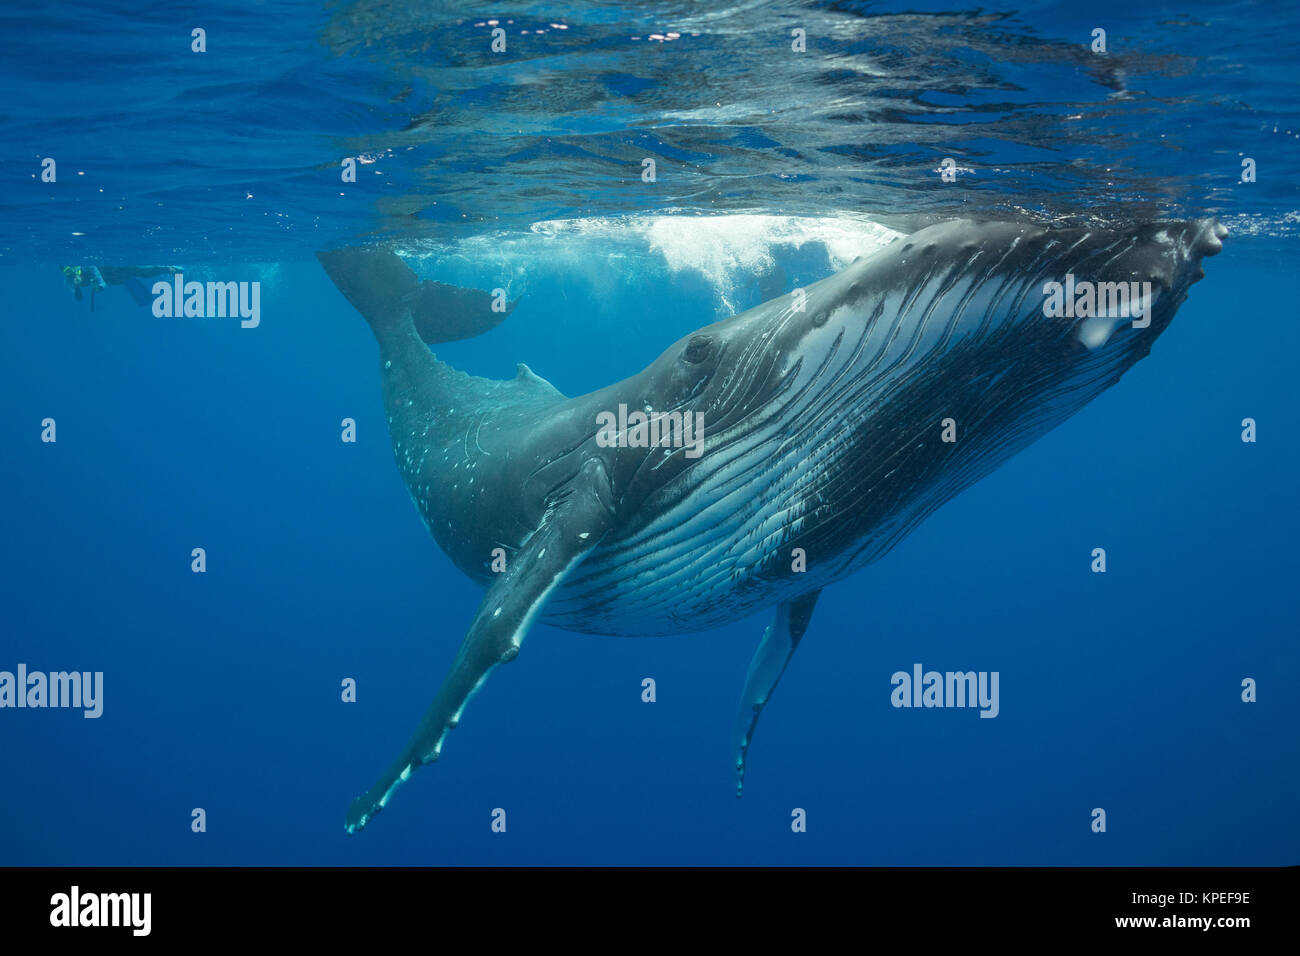 La ballena jorobada, Megaptera novaeangliae, y nadadores, Vava'u, Tonga, Pacífico Sur, MR 497 Foto de stock